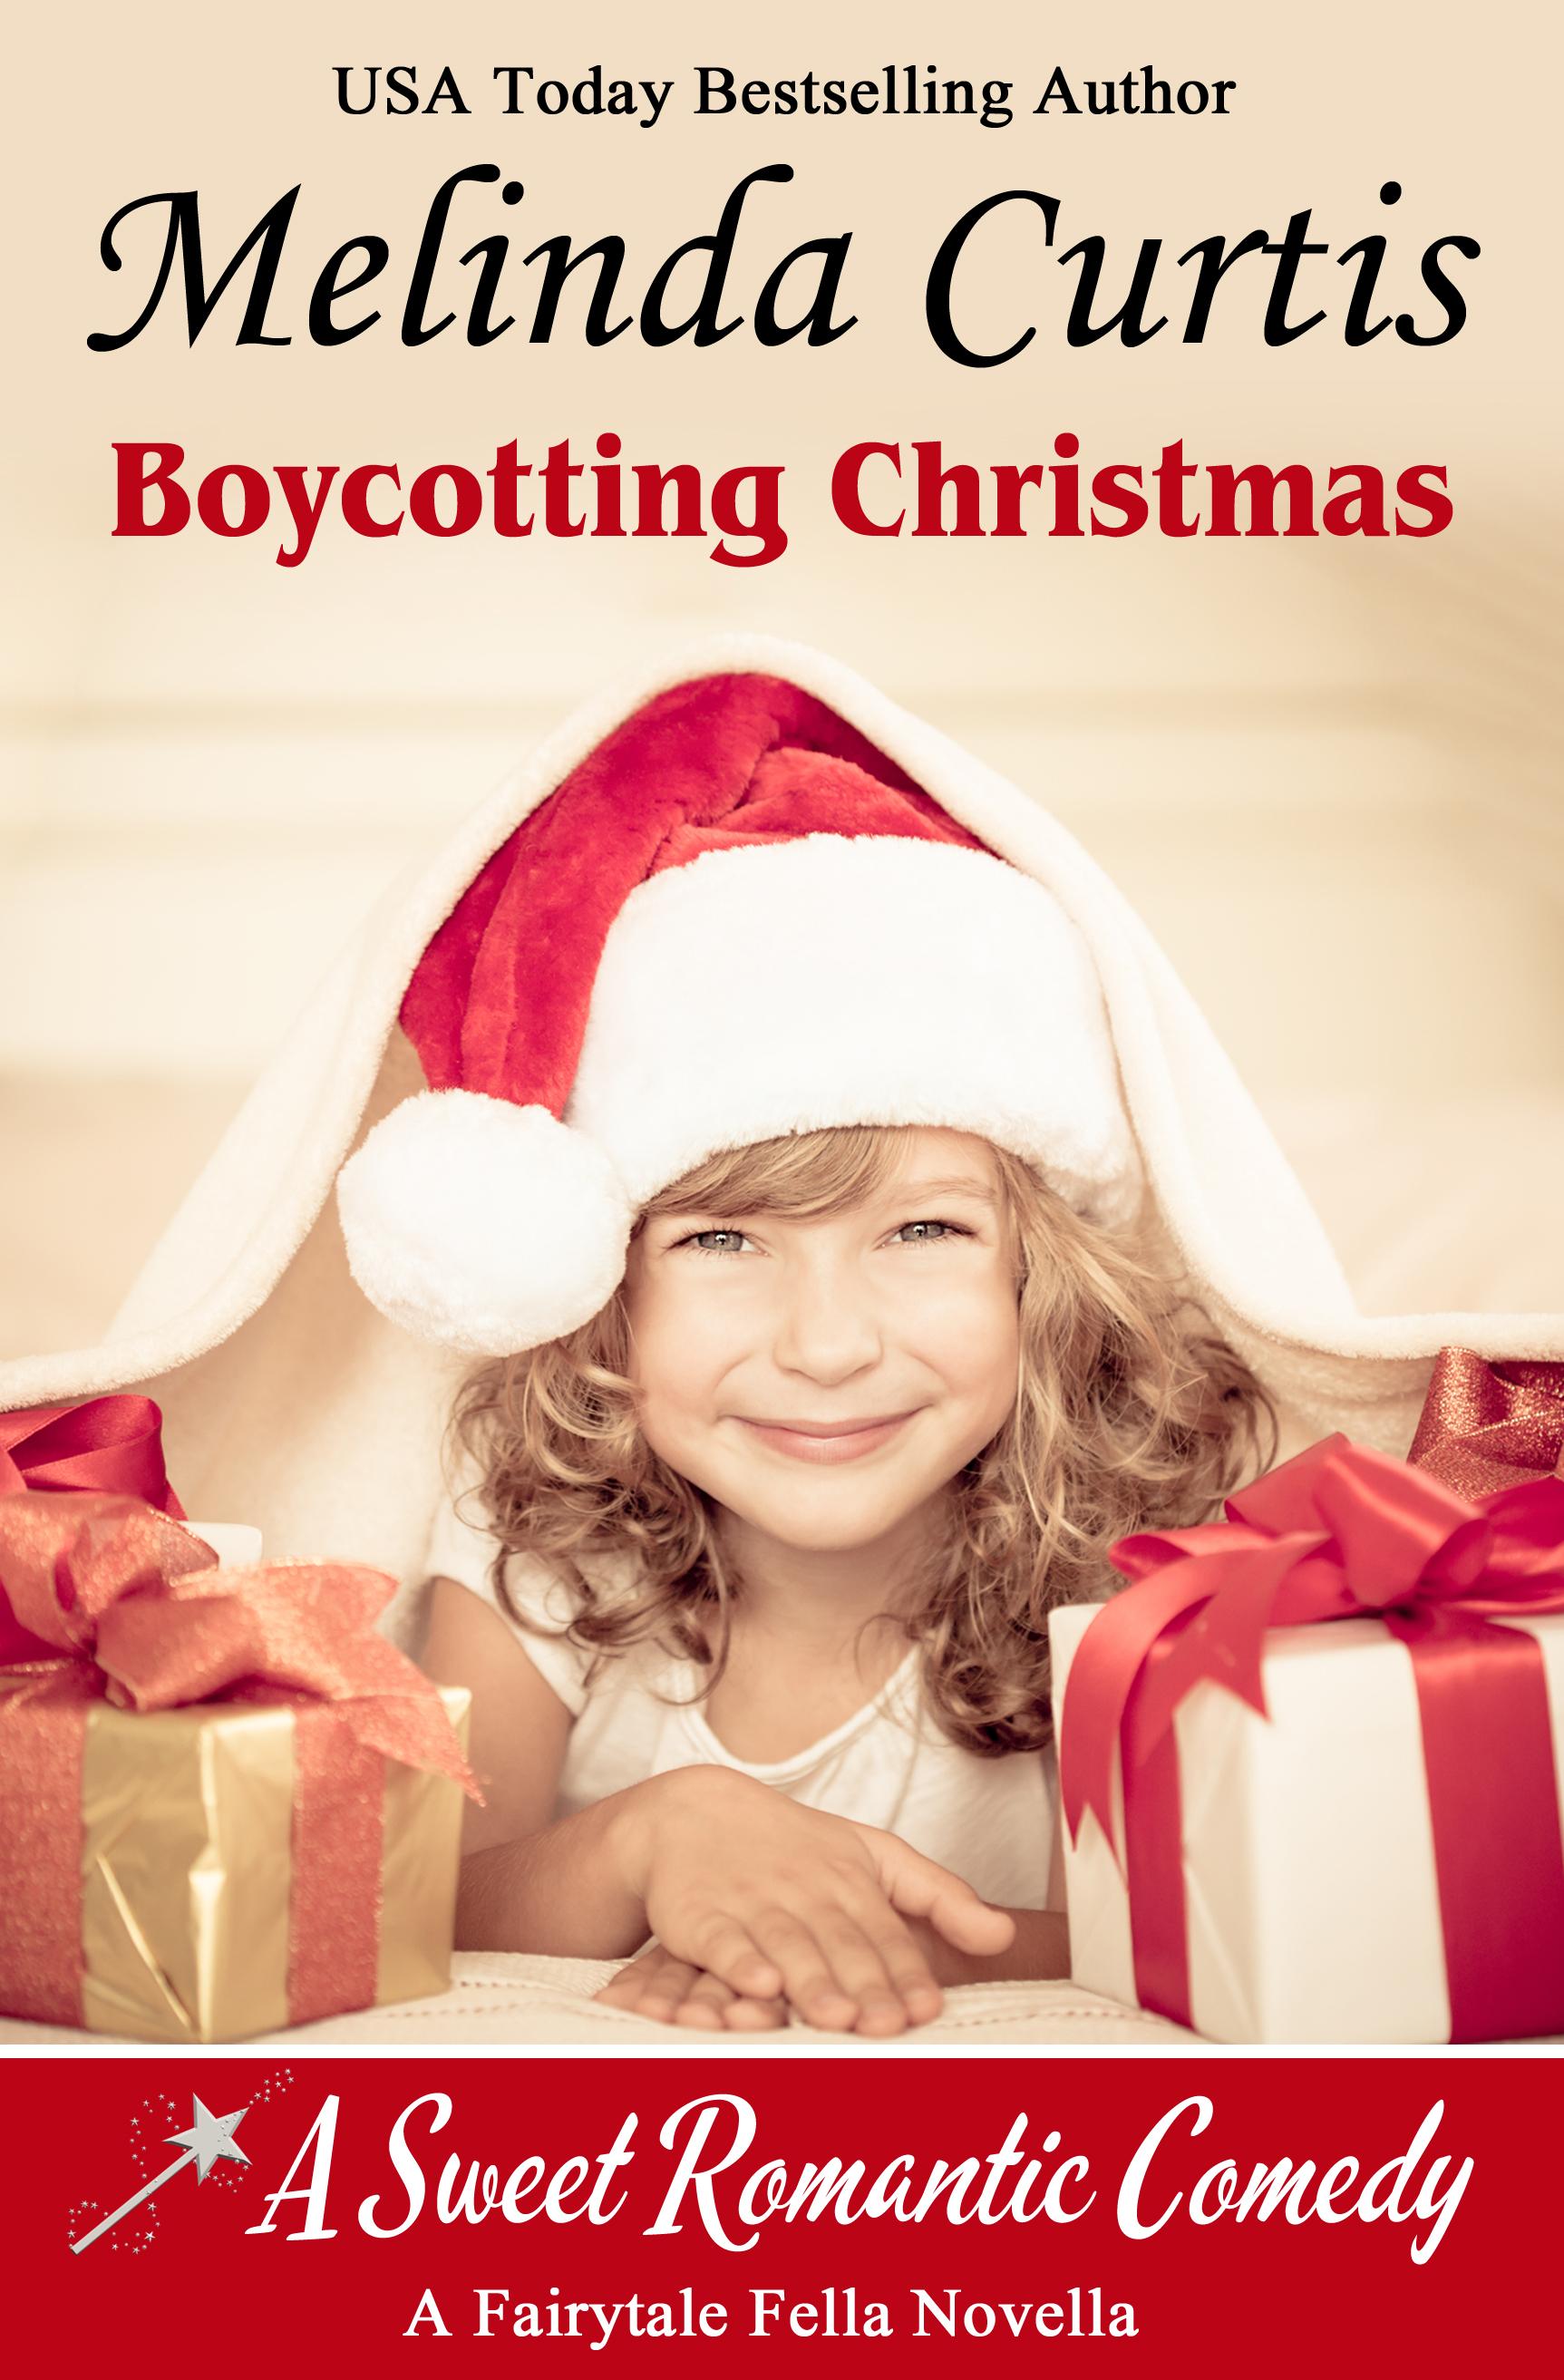 Boycotting Chirstmas_Melinda Curtis.jpg